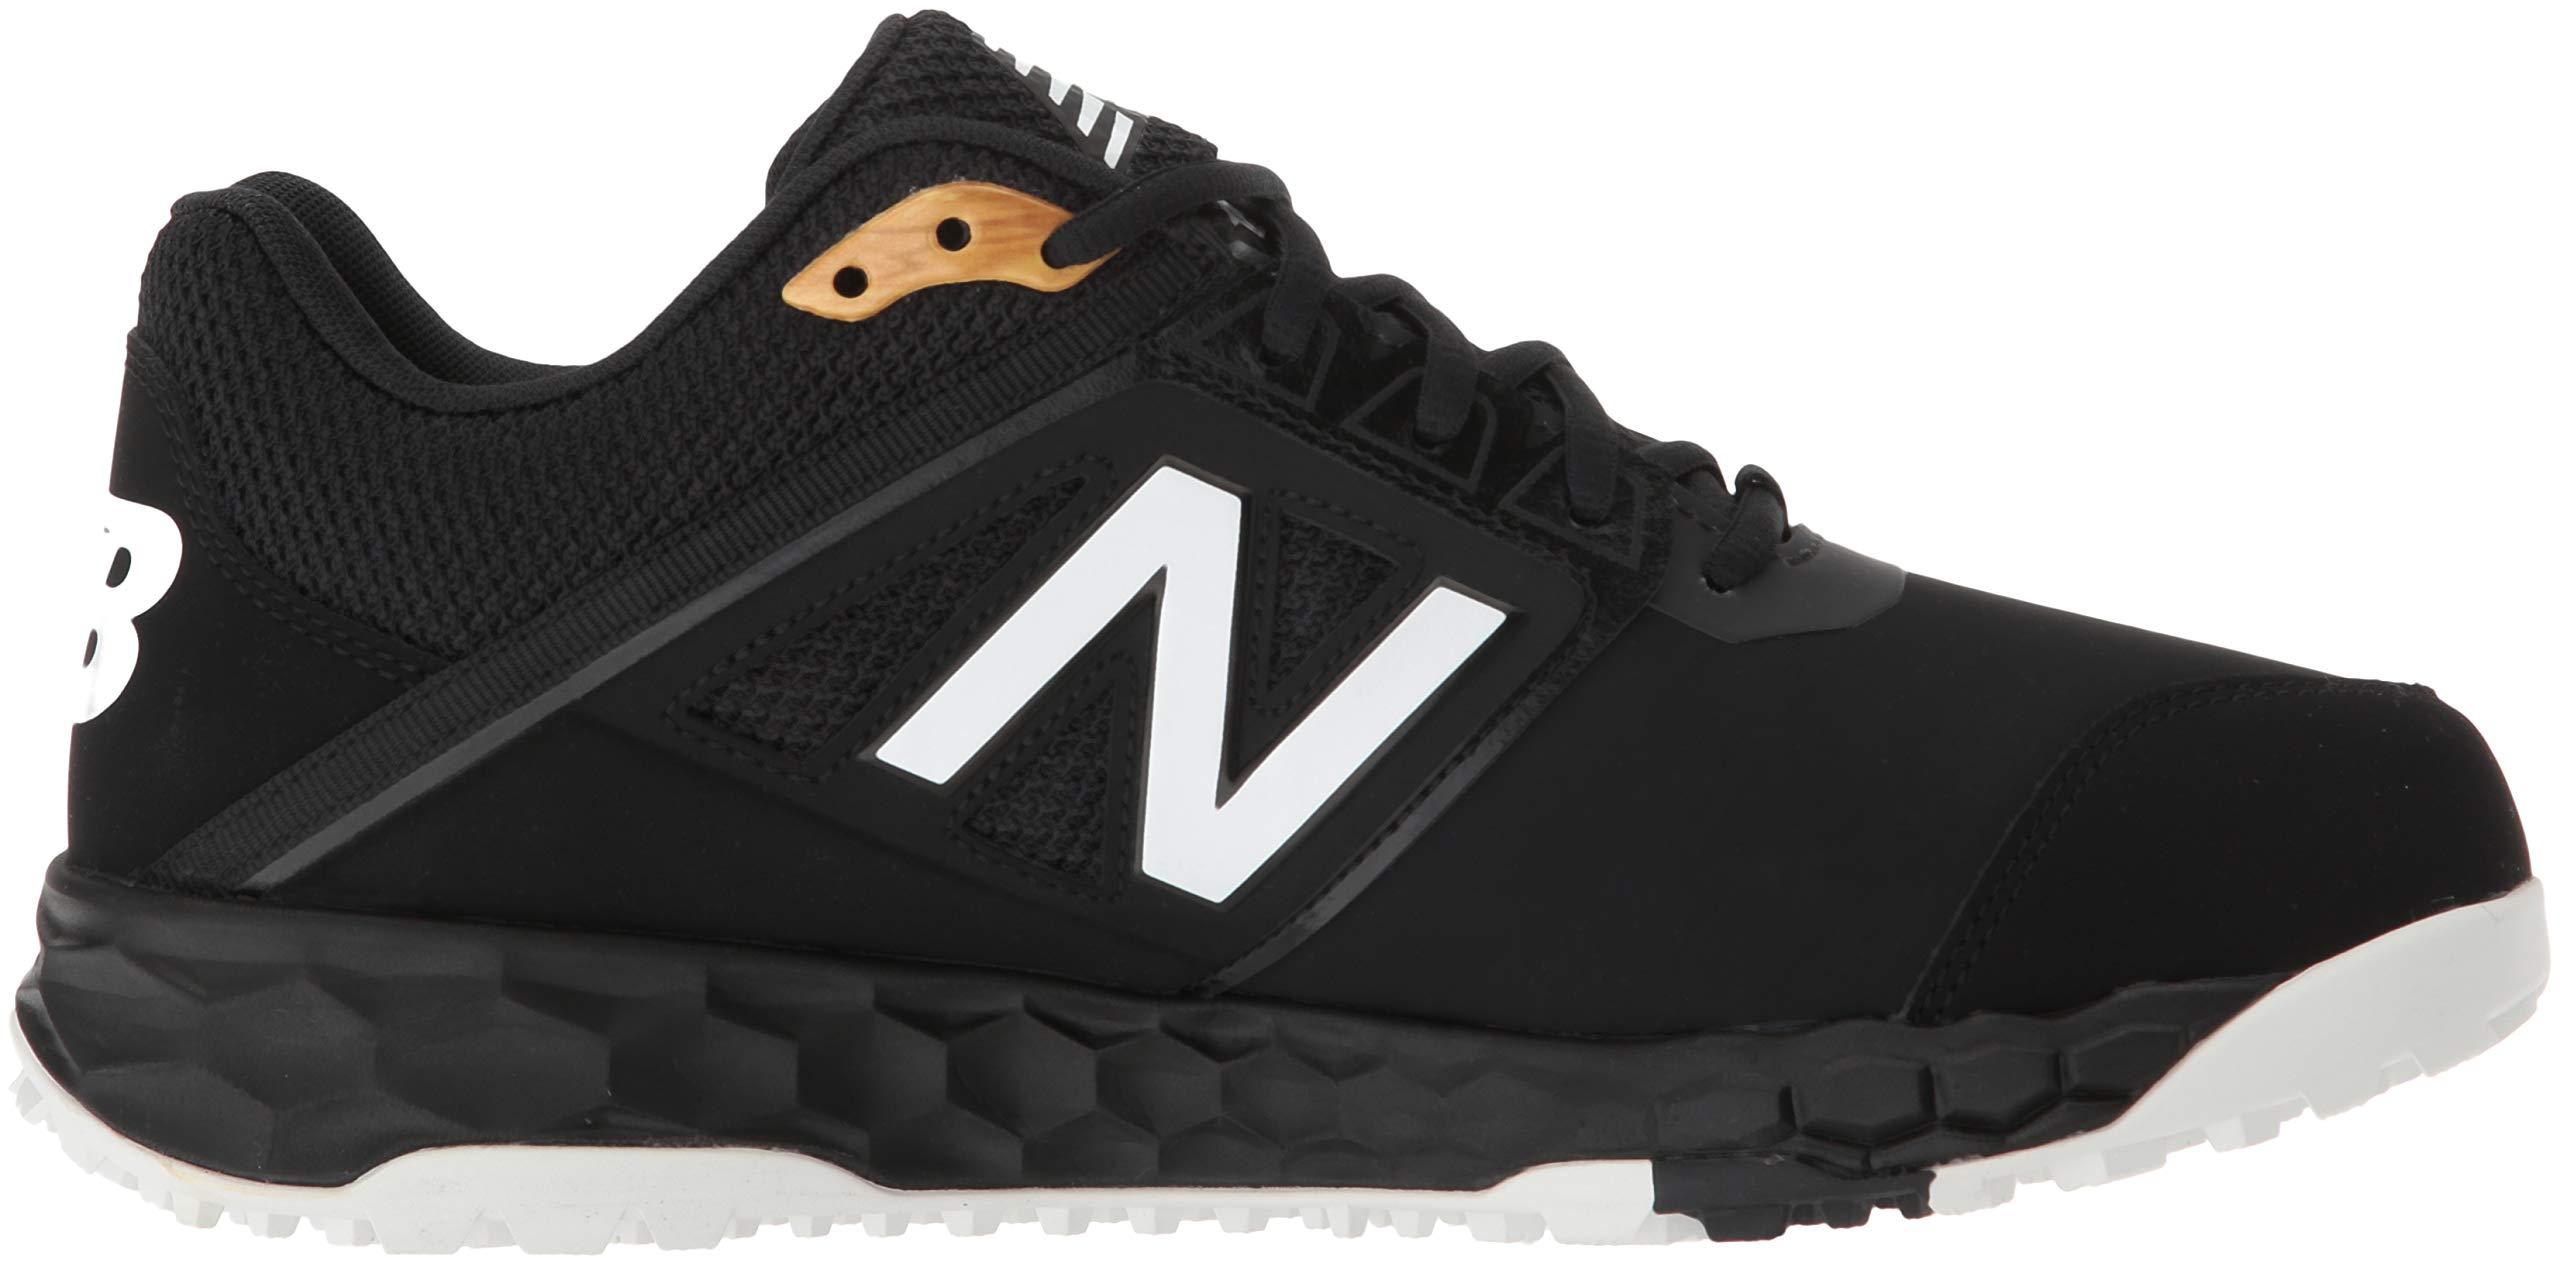 New Balance Men's 3000v4 Turf Baseball Shoe, Black, 5 D US by New Balance (Image #7)